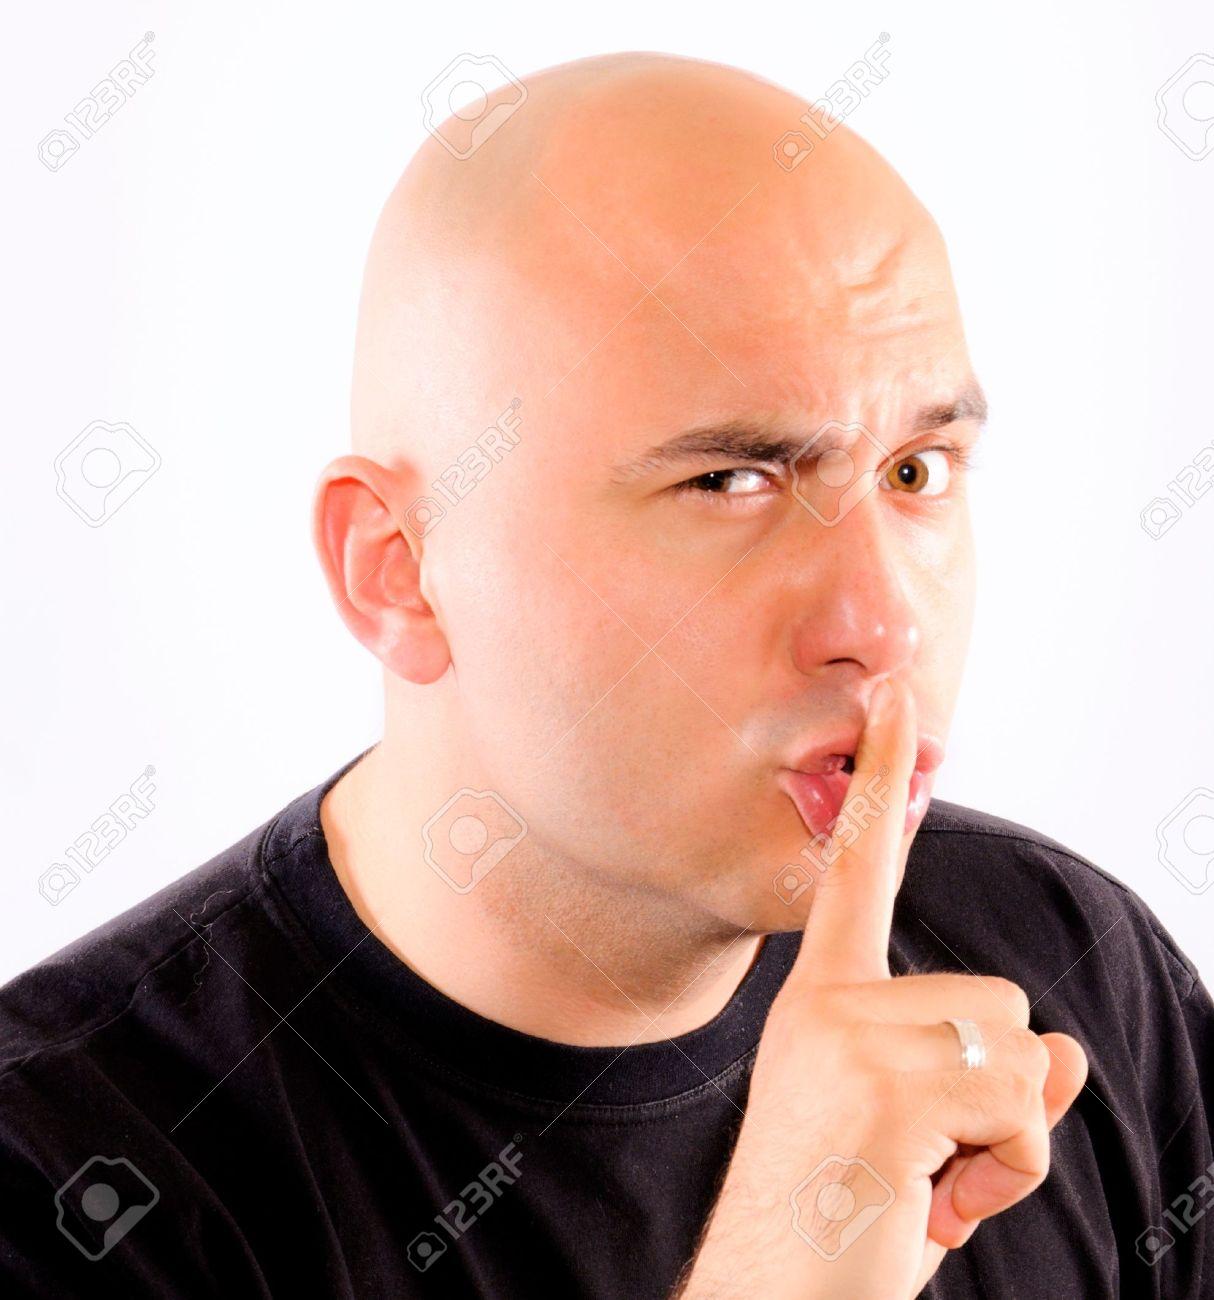 Shhh silence please Stock Photo - 13737585